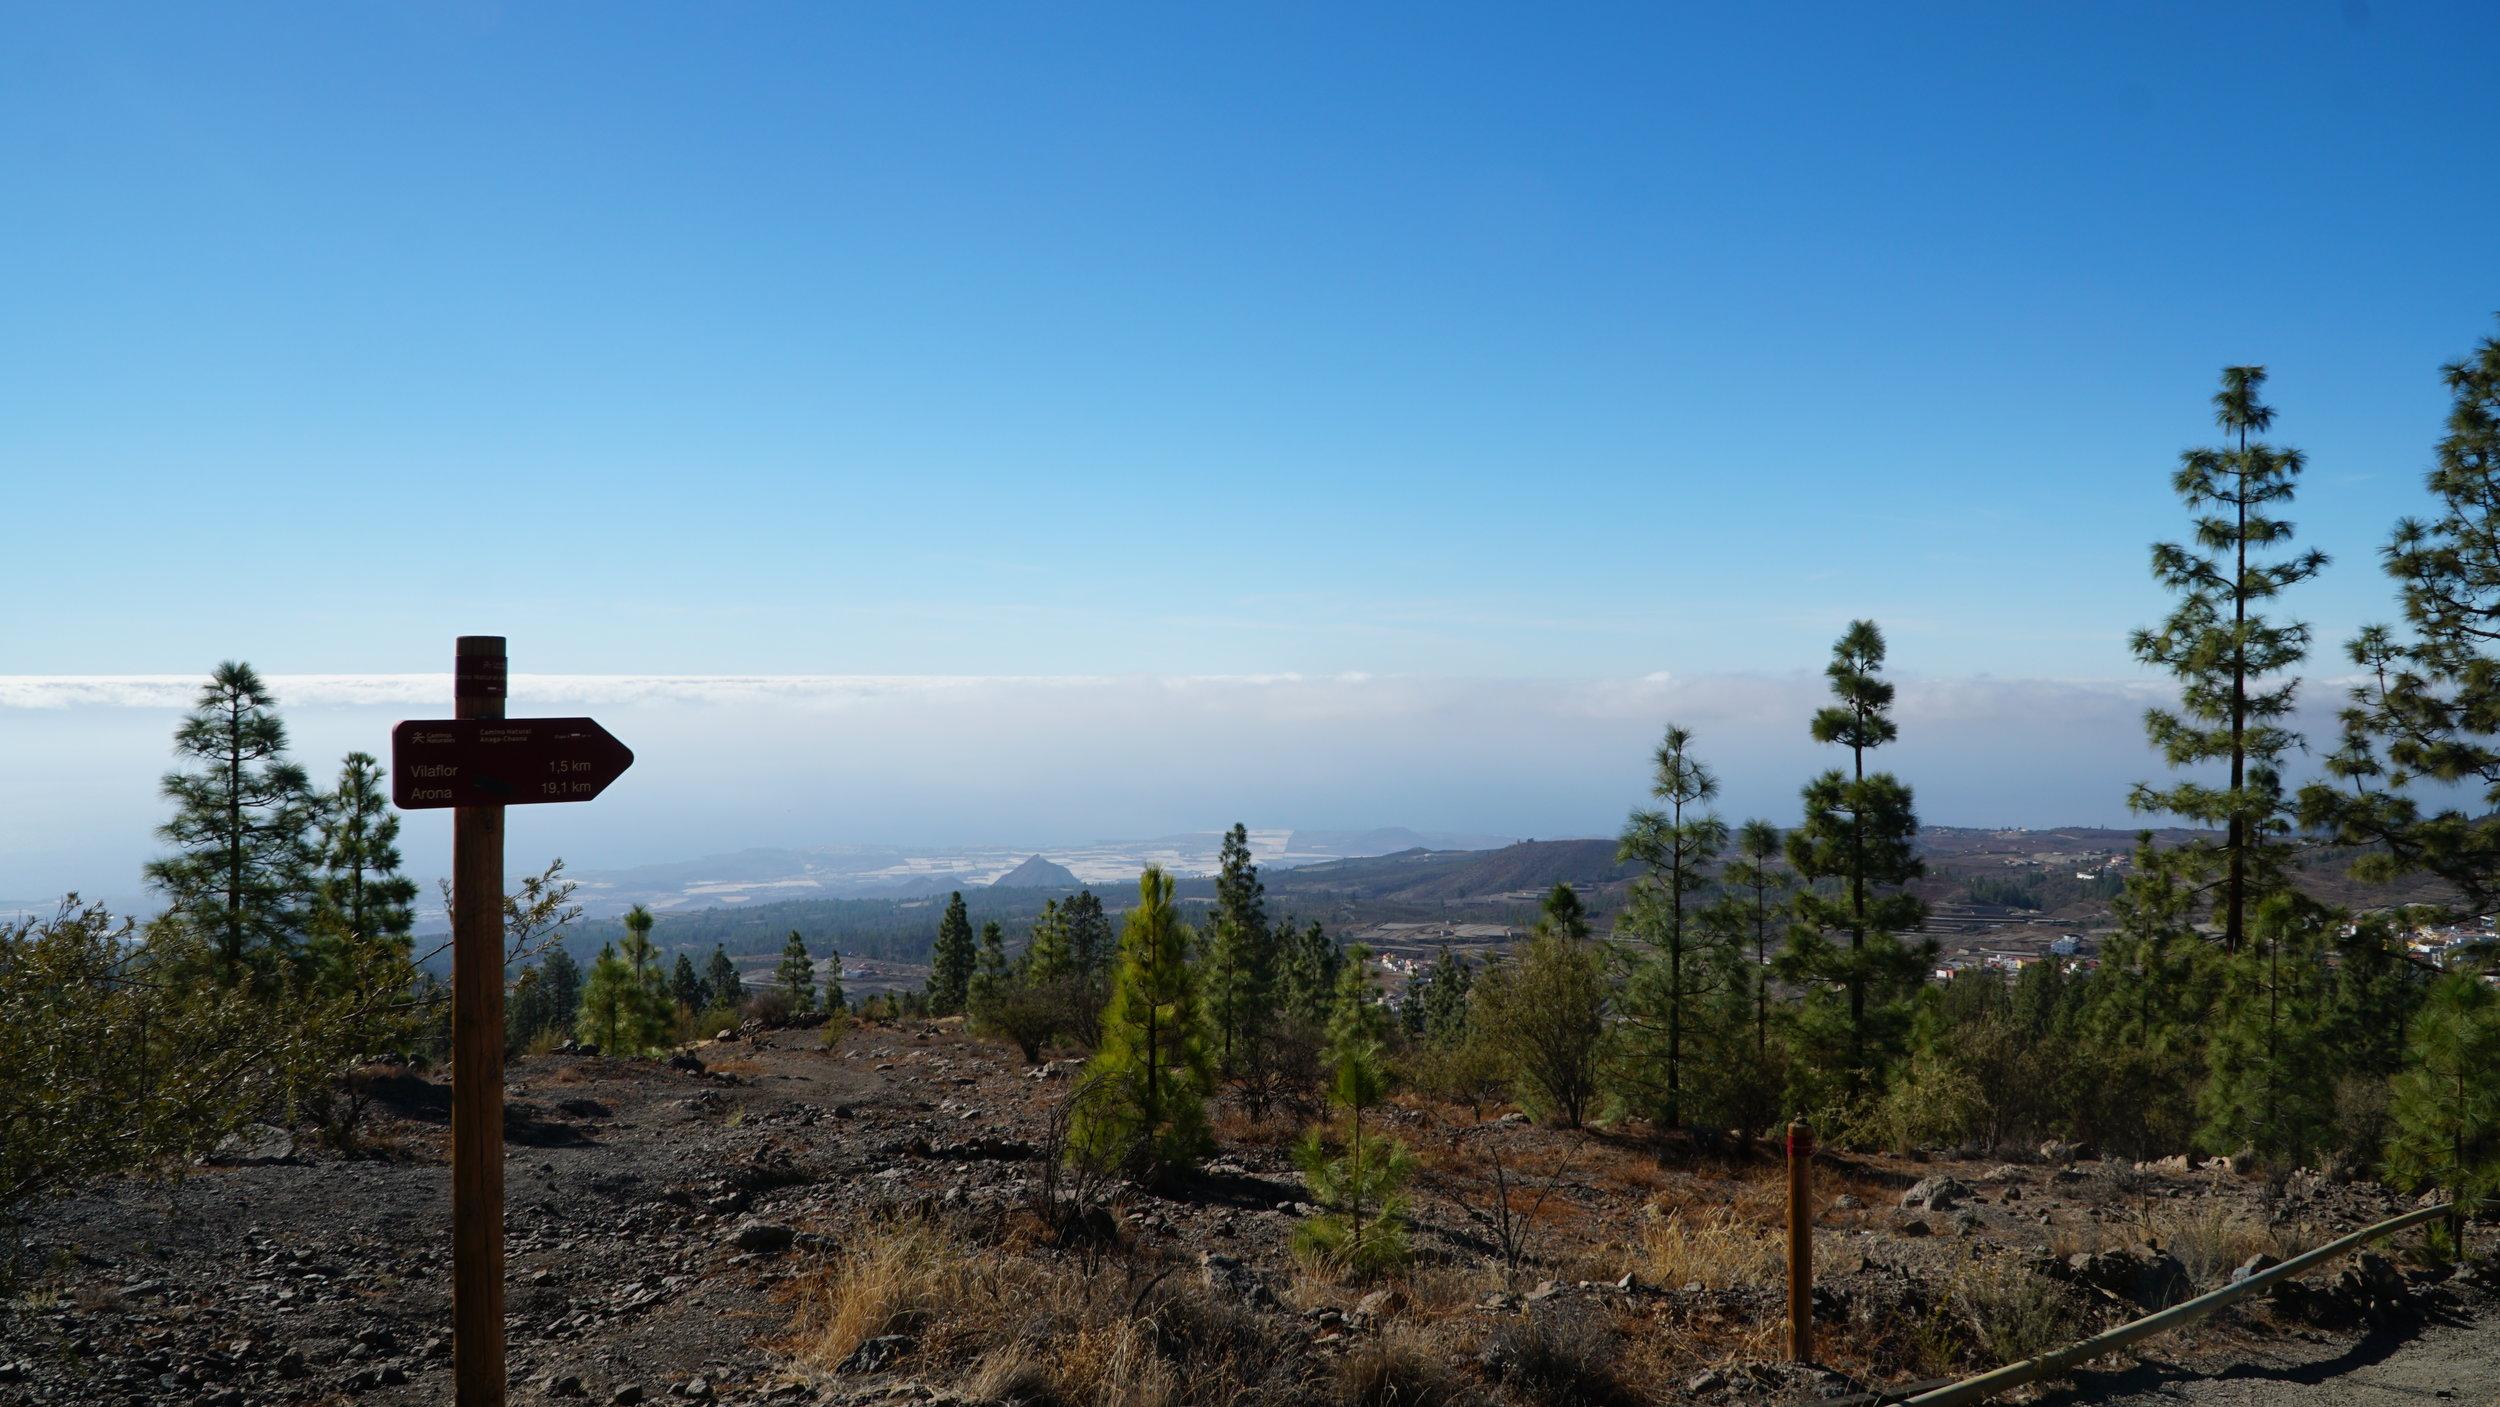 Udsigten over de tynde fyrreskove